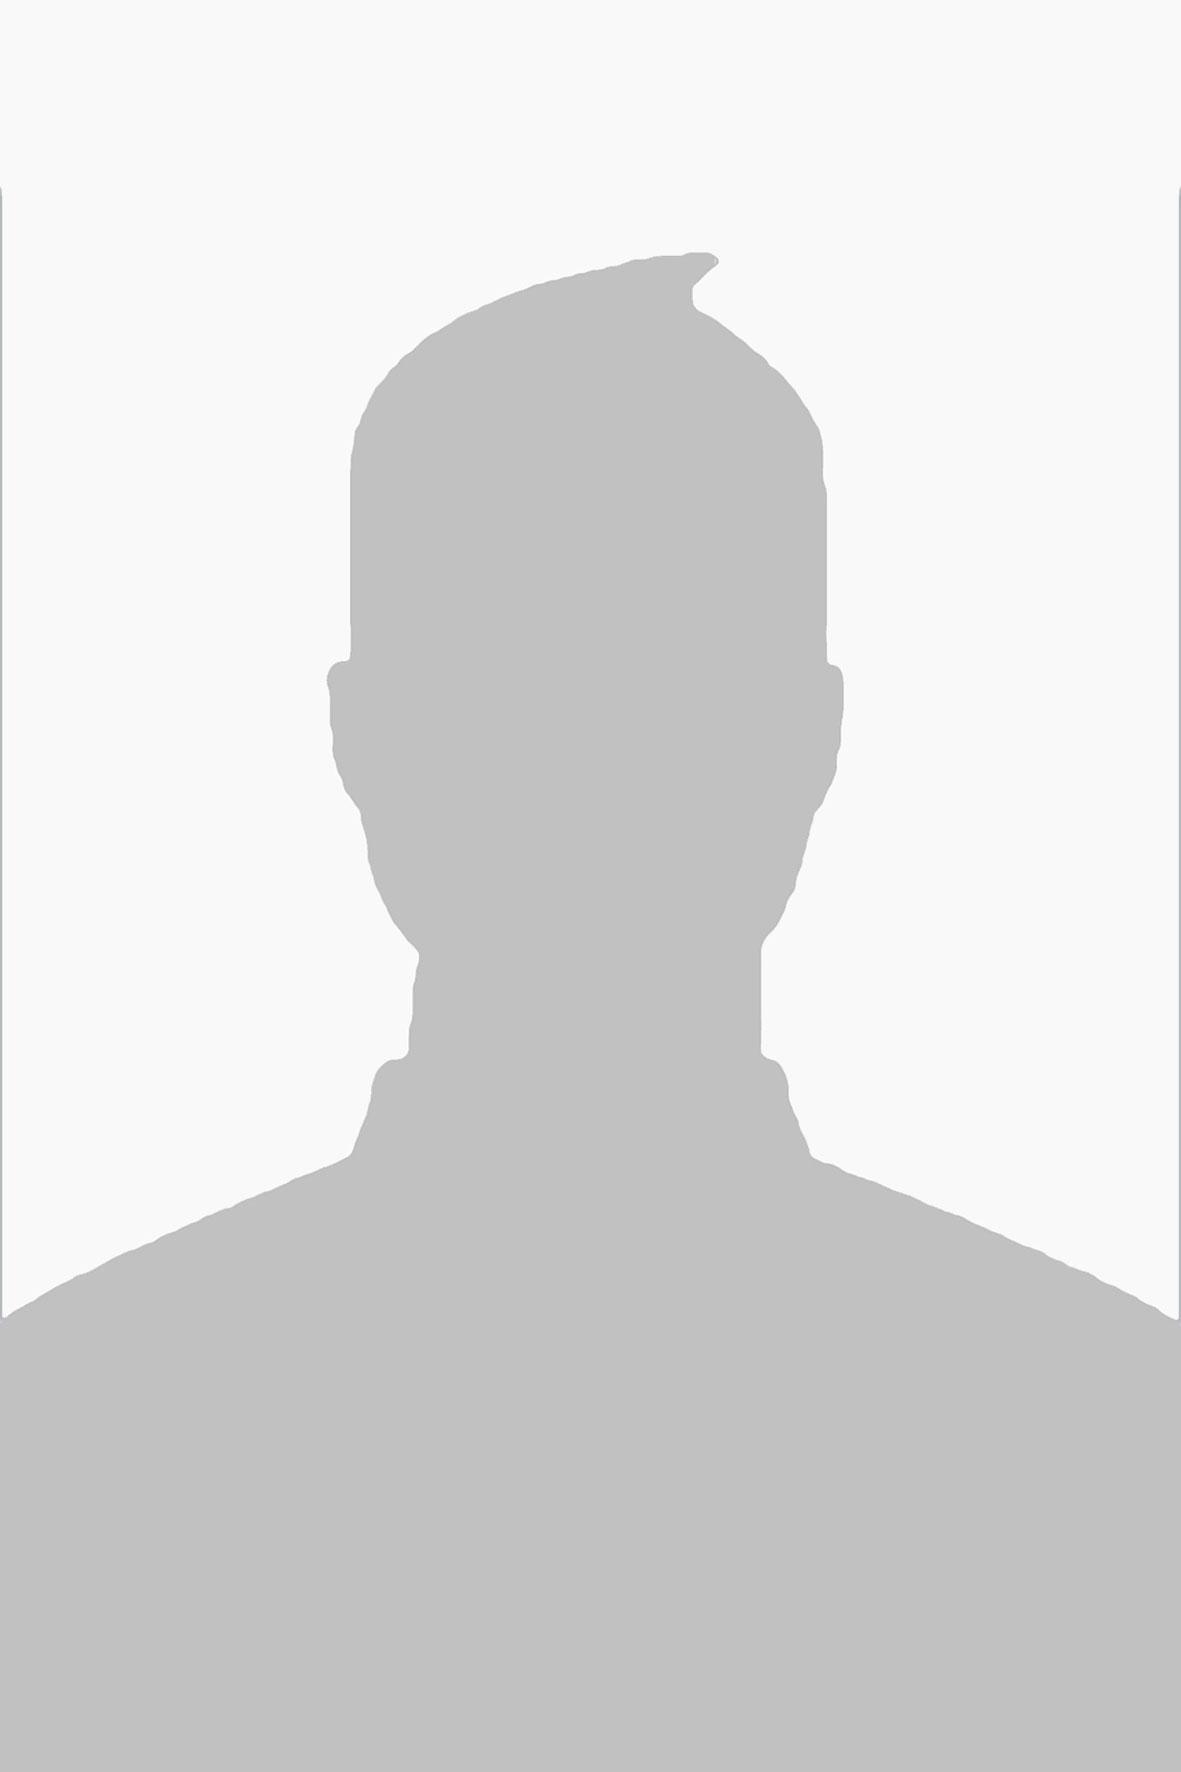 team_placeholder